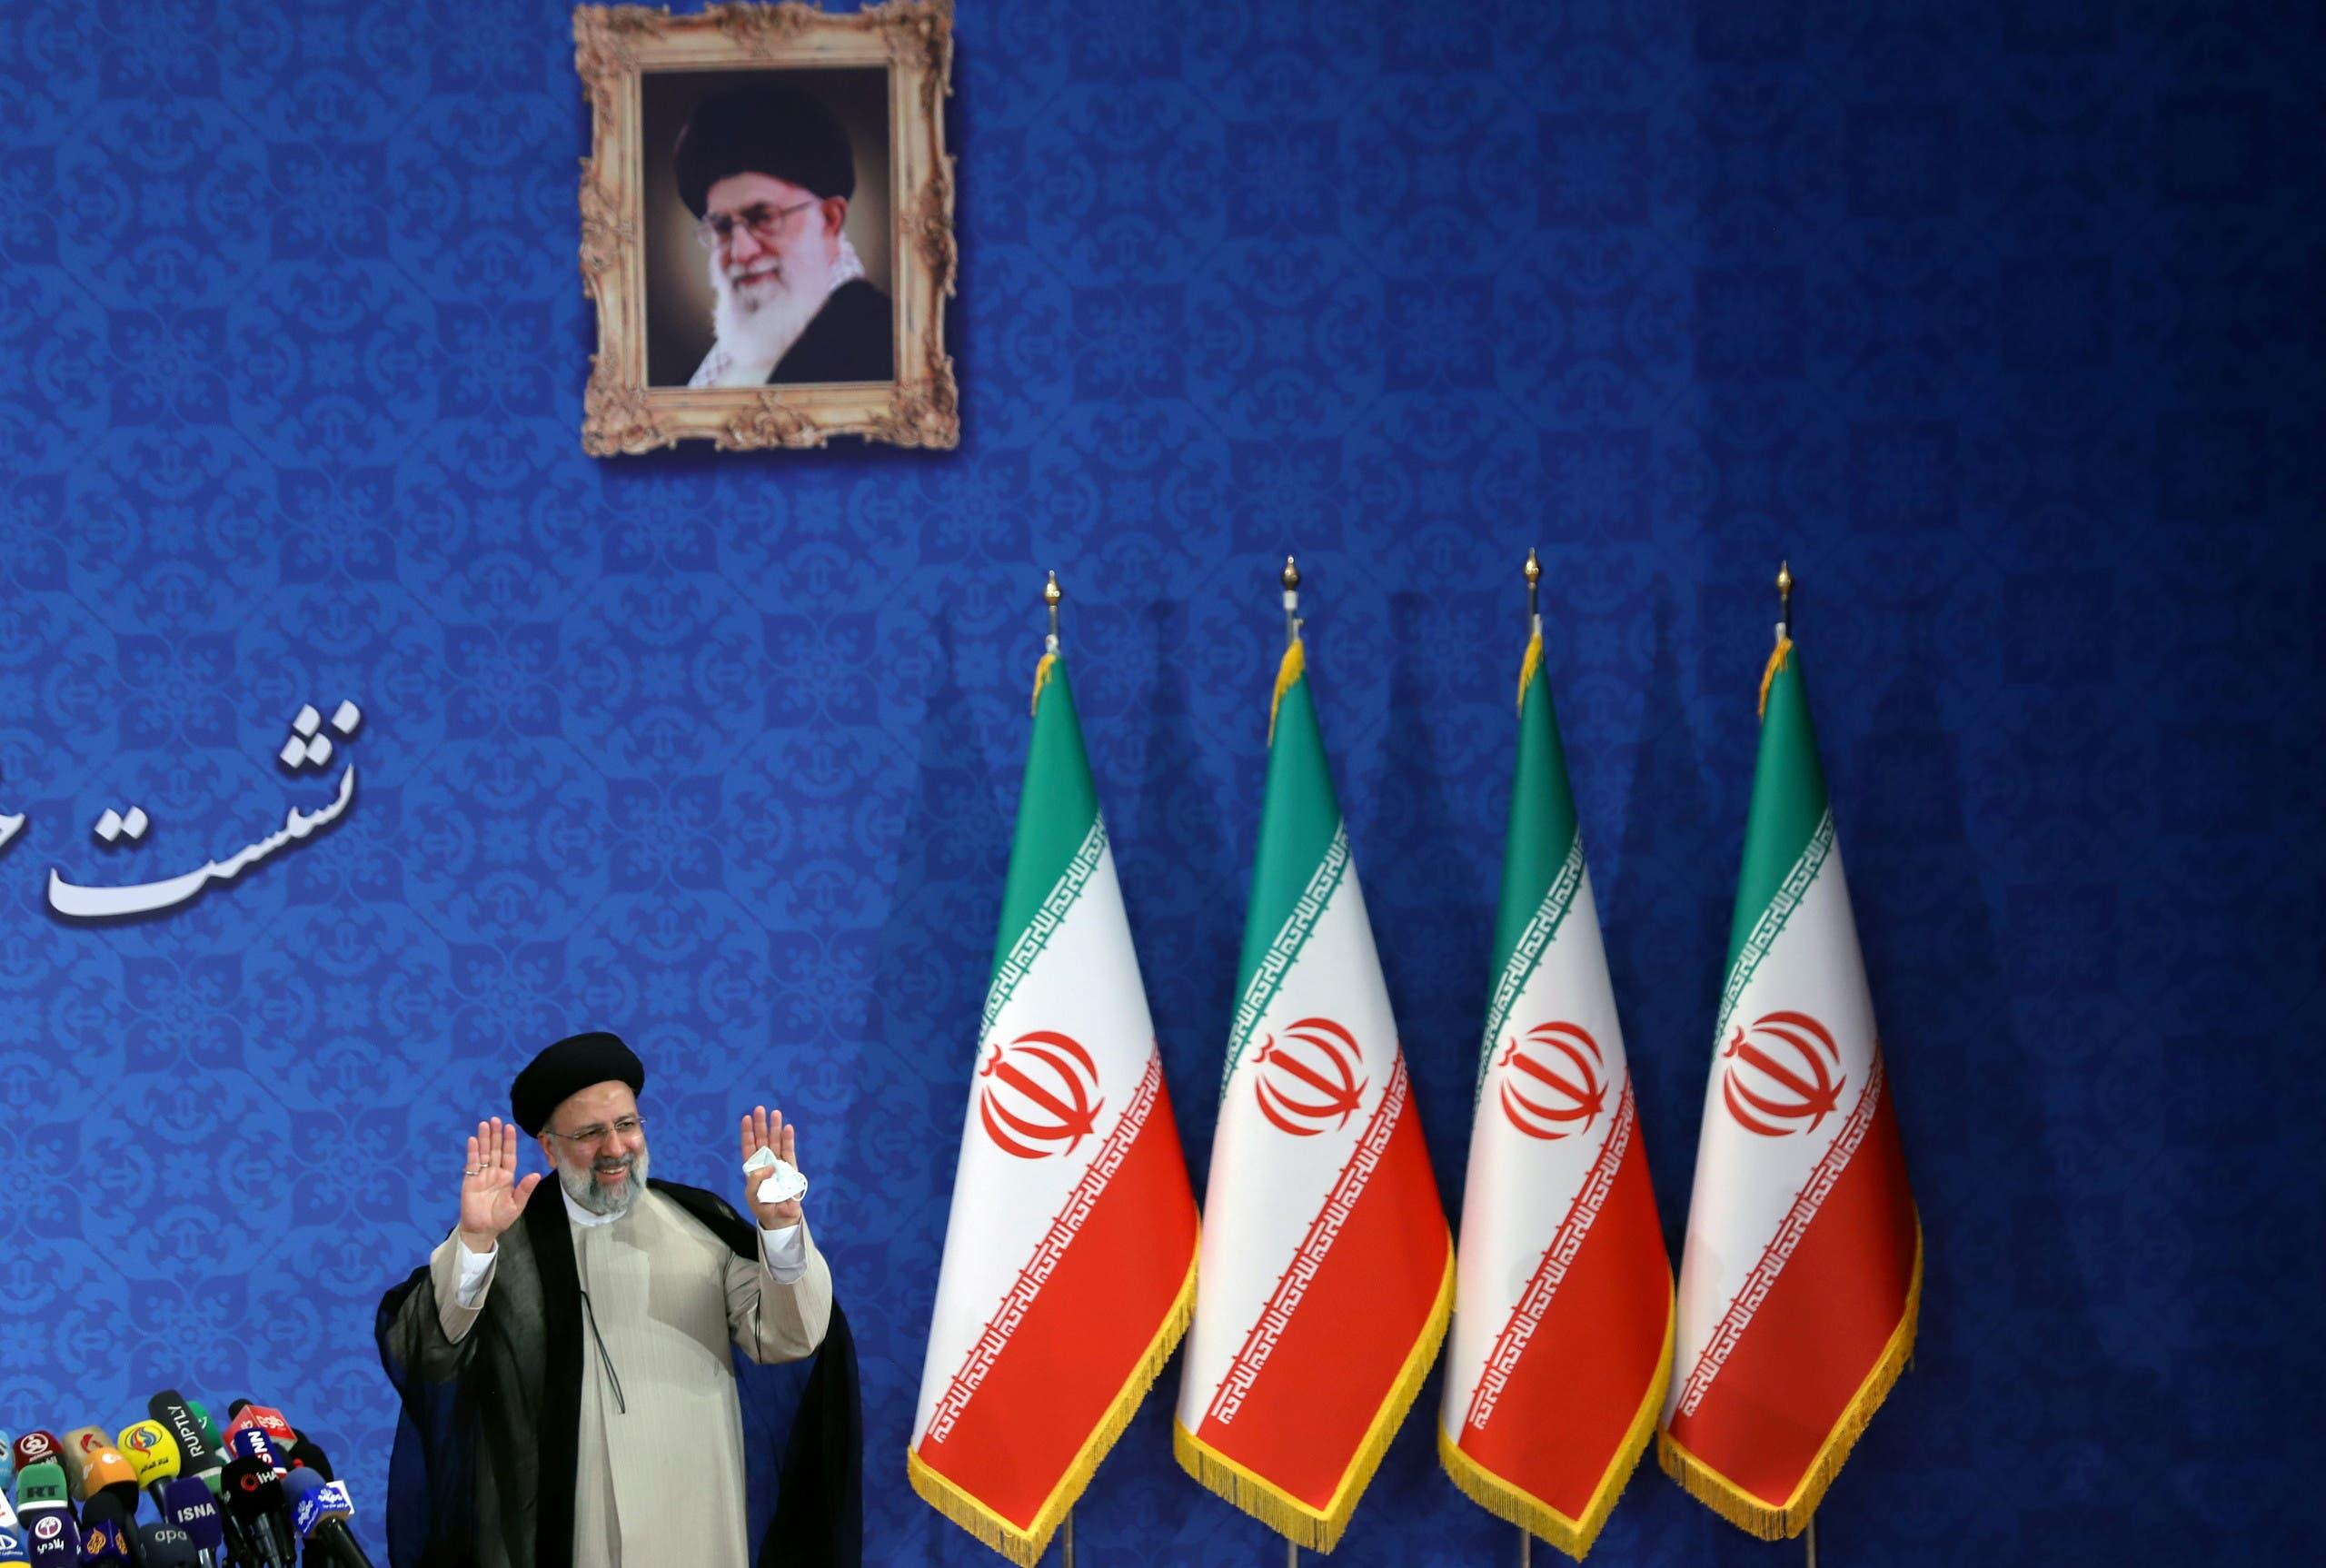 Iran's President-elect Ebrahim Raisi attends a news conference in Tehran, Iran June 21, 2021. (Reuters)